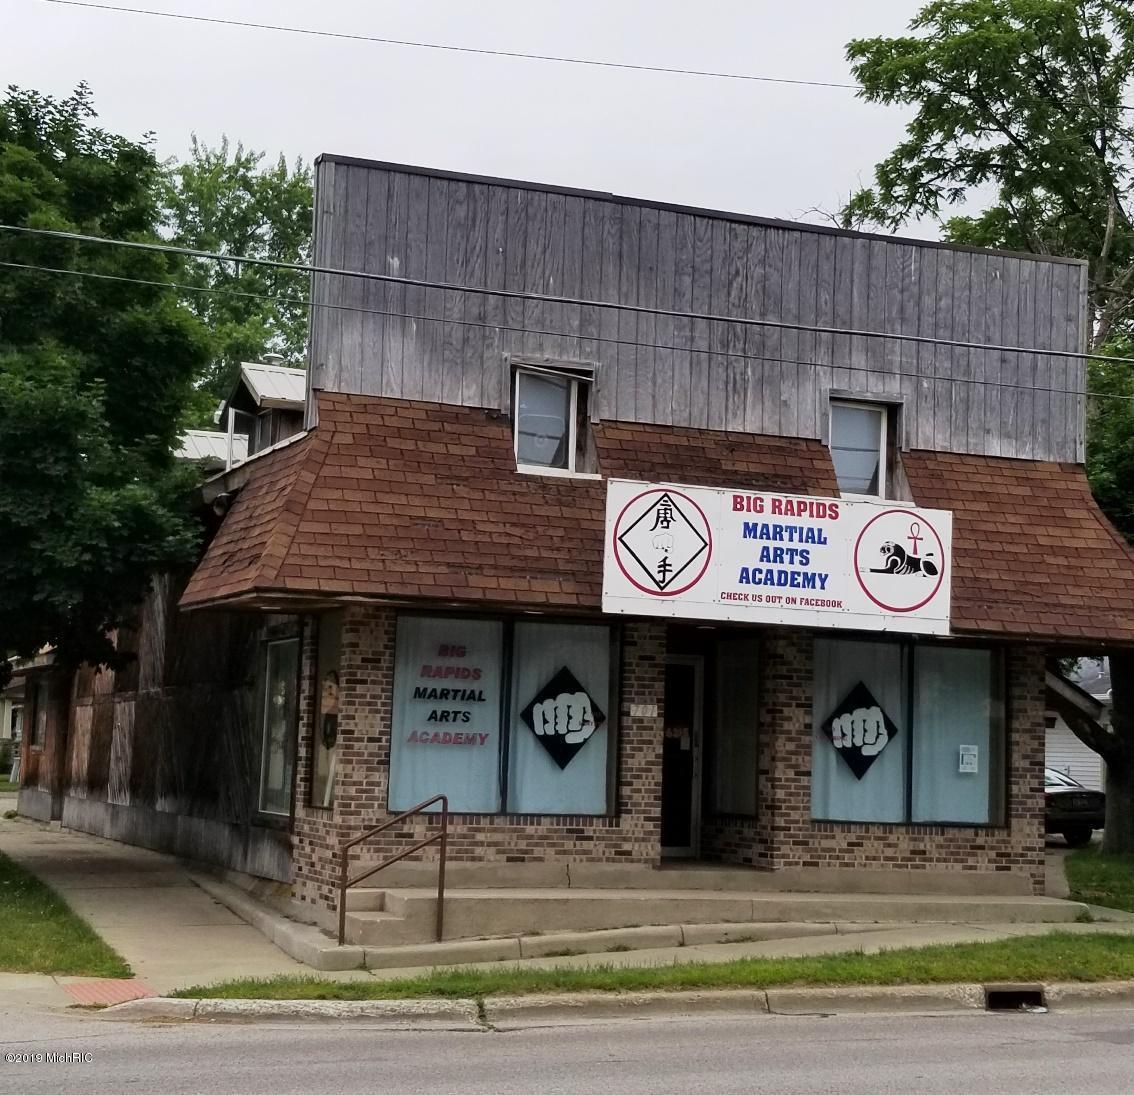 701 Maple Street, Big Rapids, MI   MLS# 19035063   Central